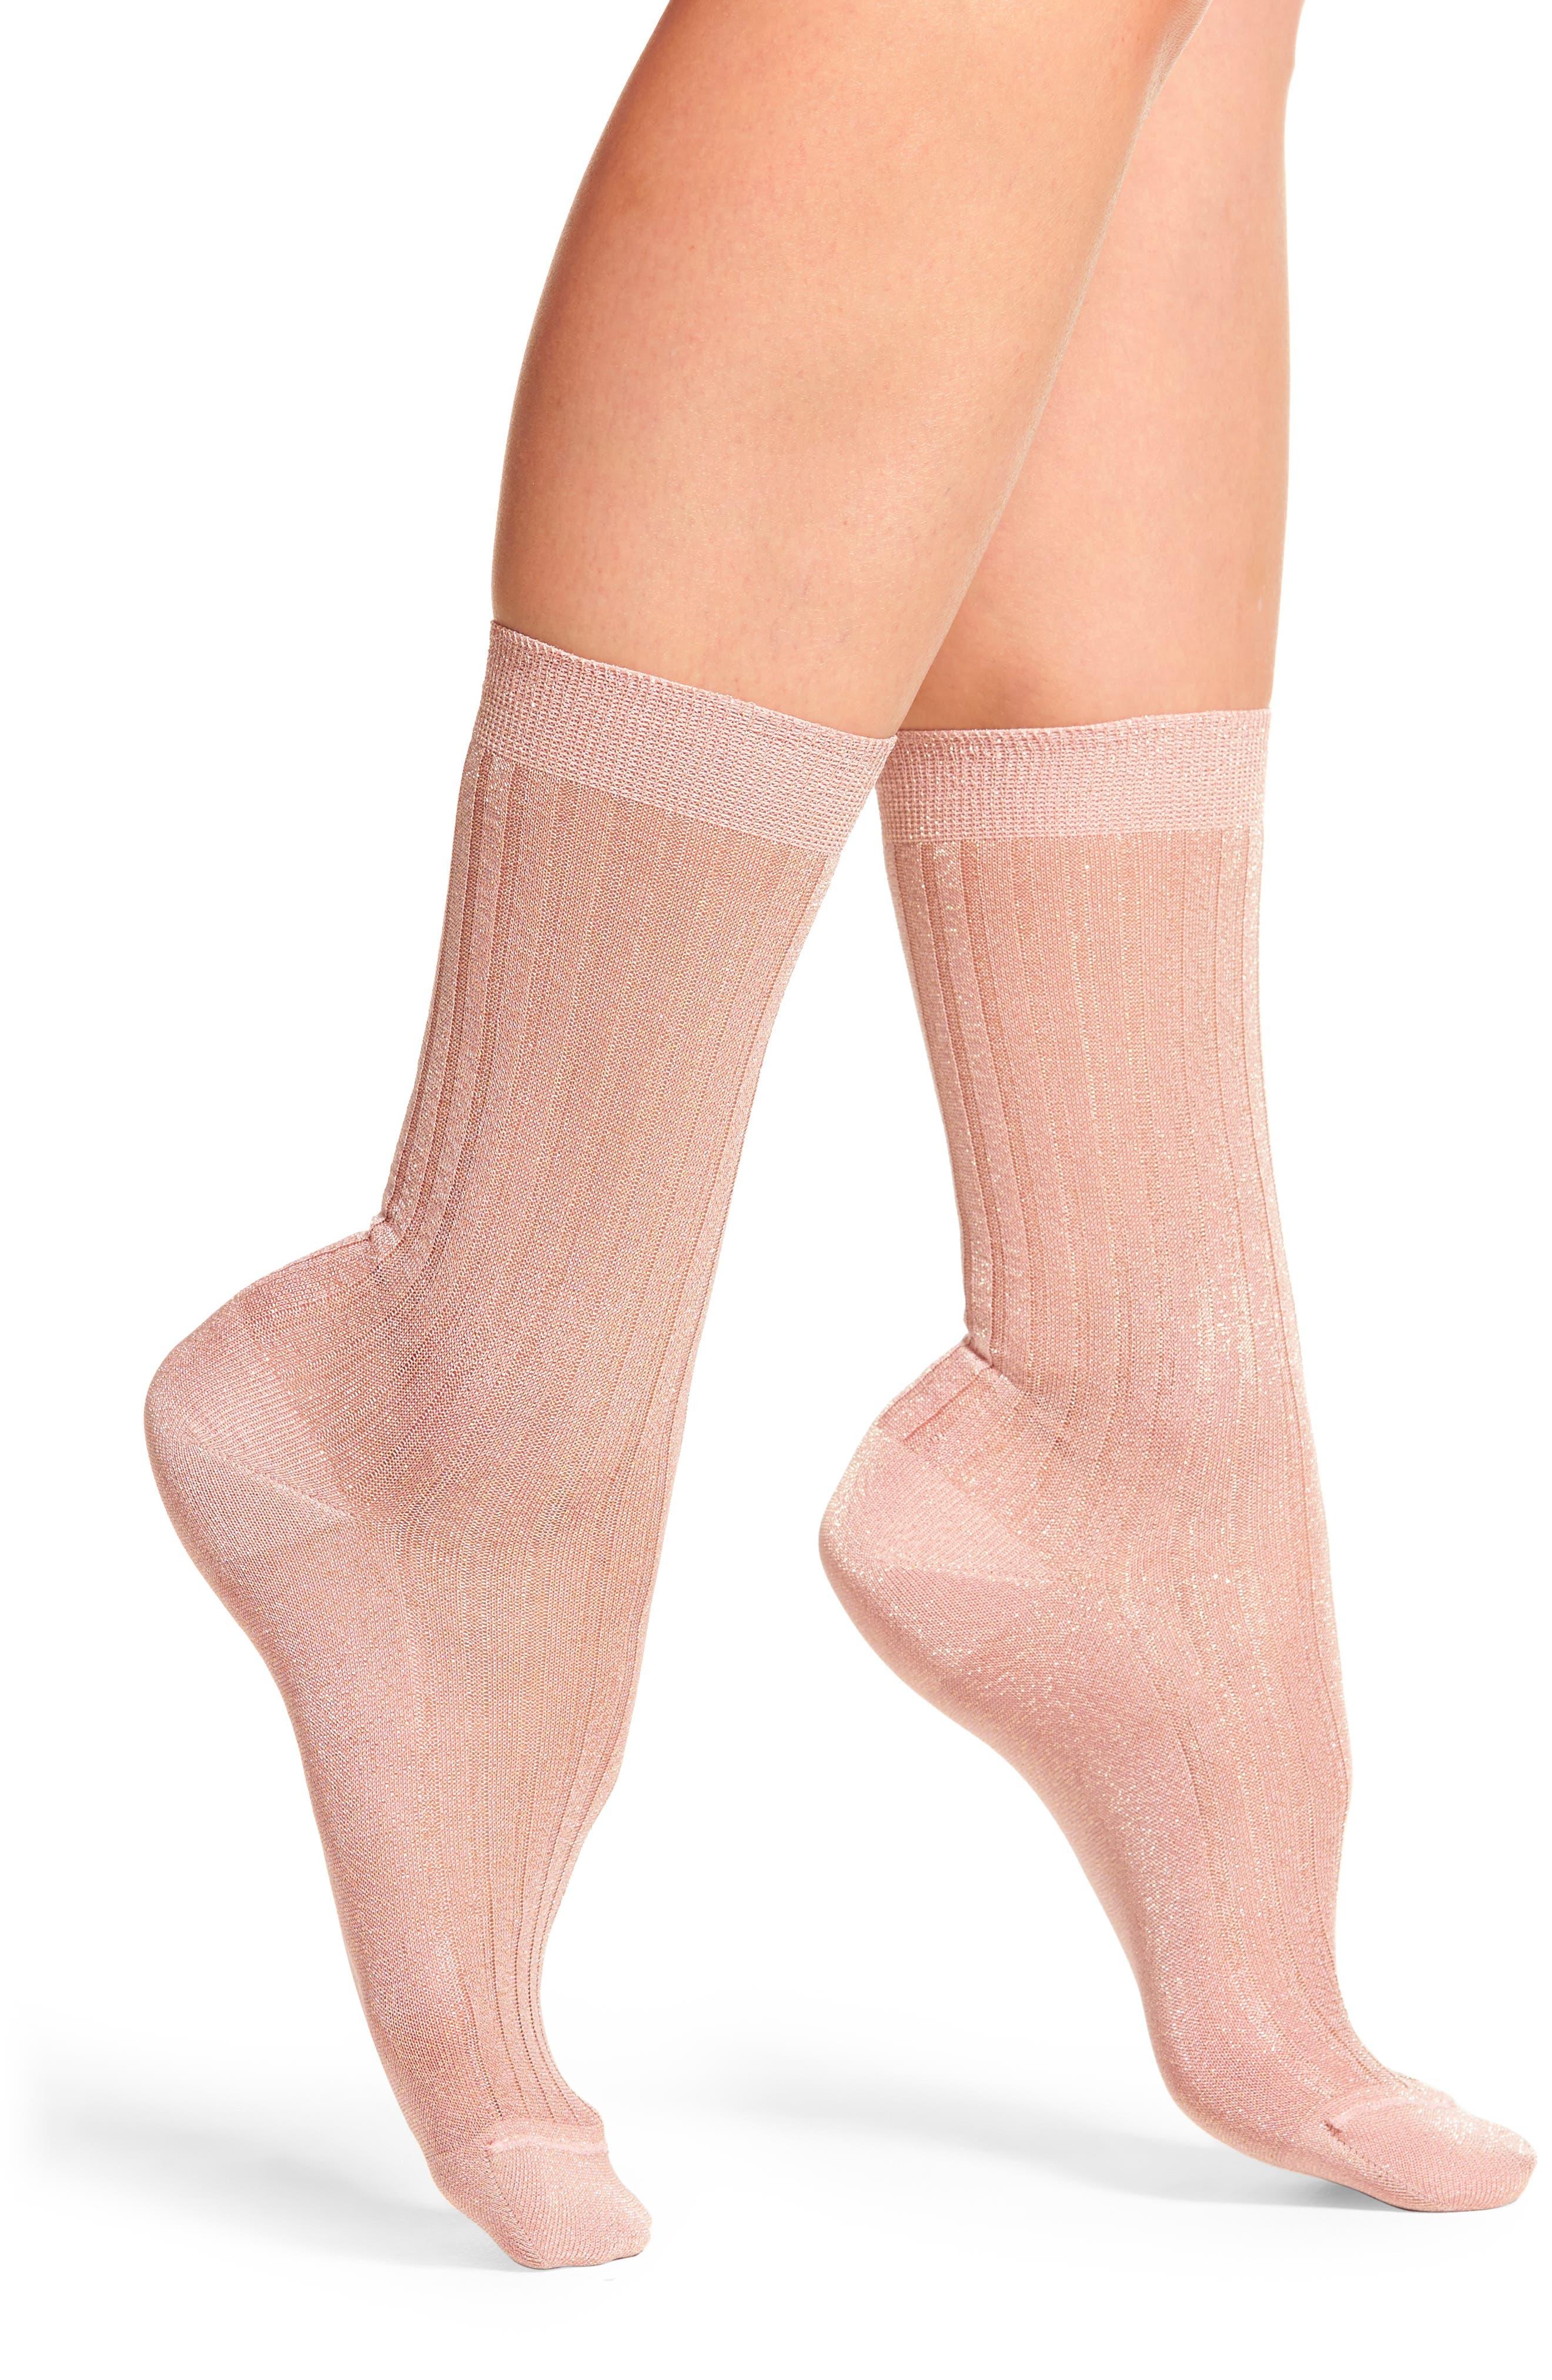 Sarah Borghi Costina Metallic Ankle Socks